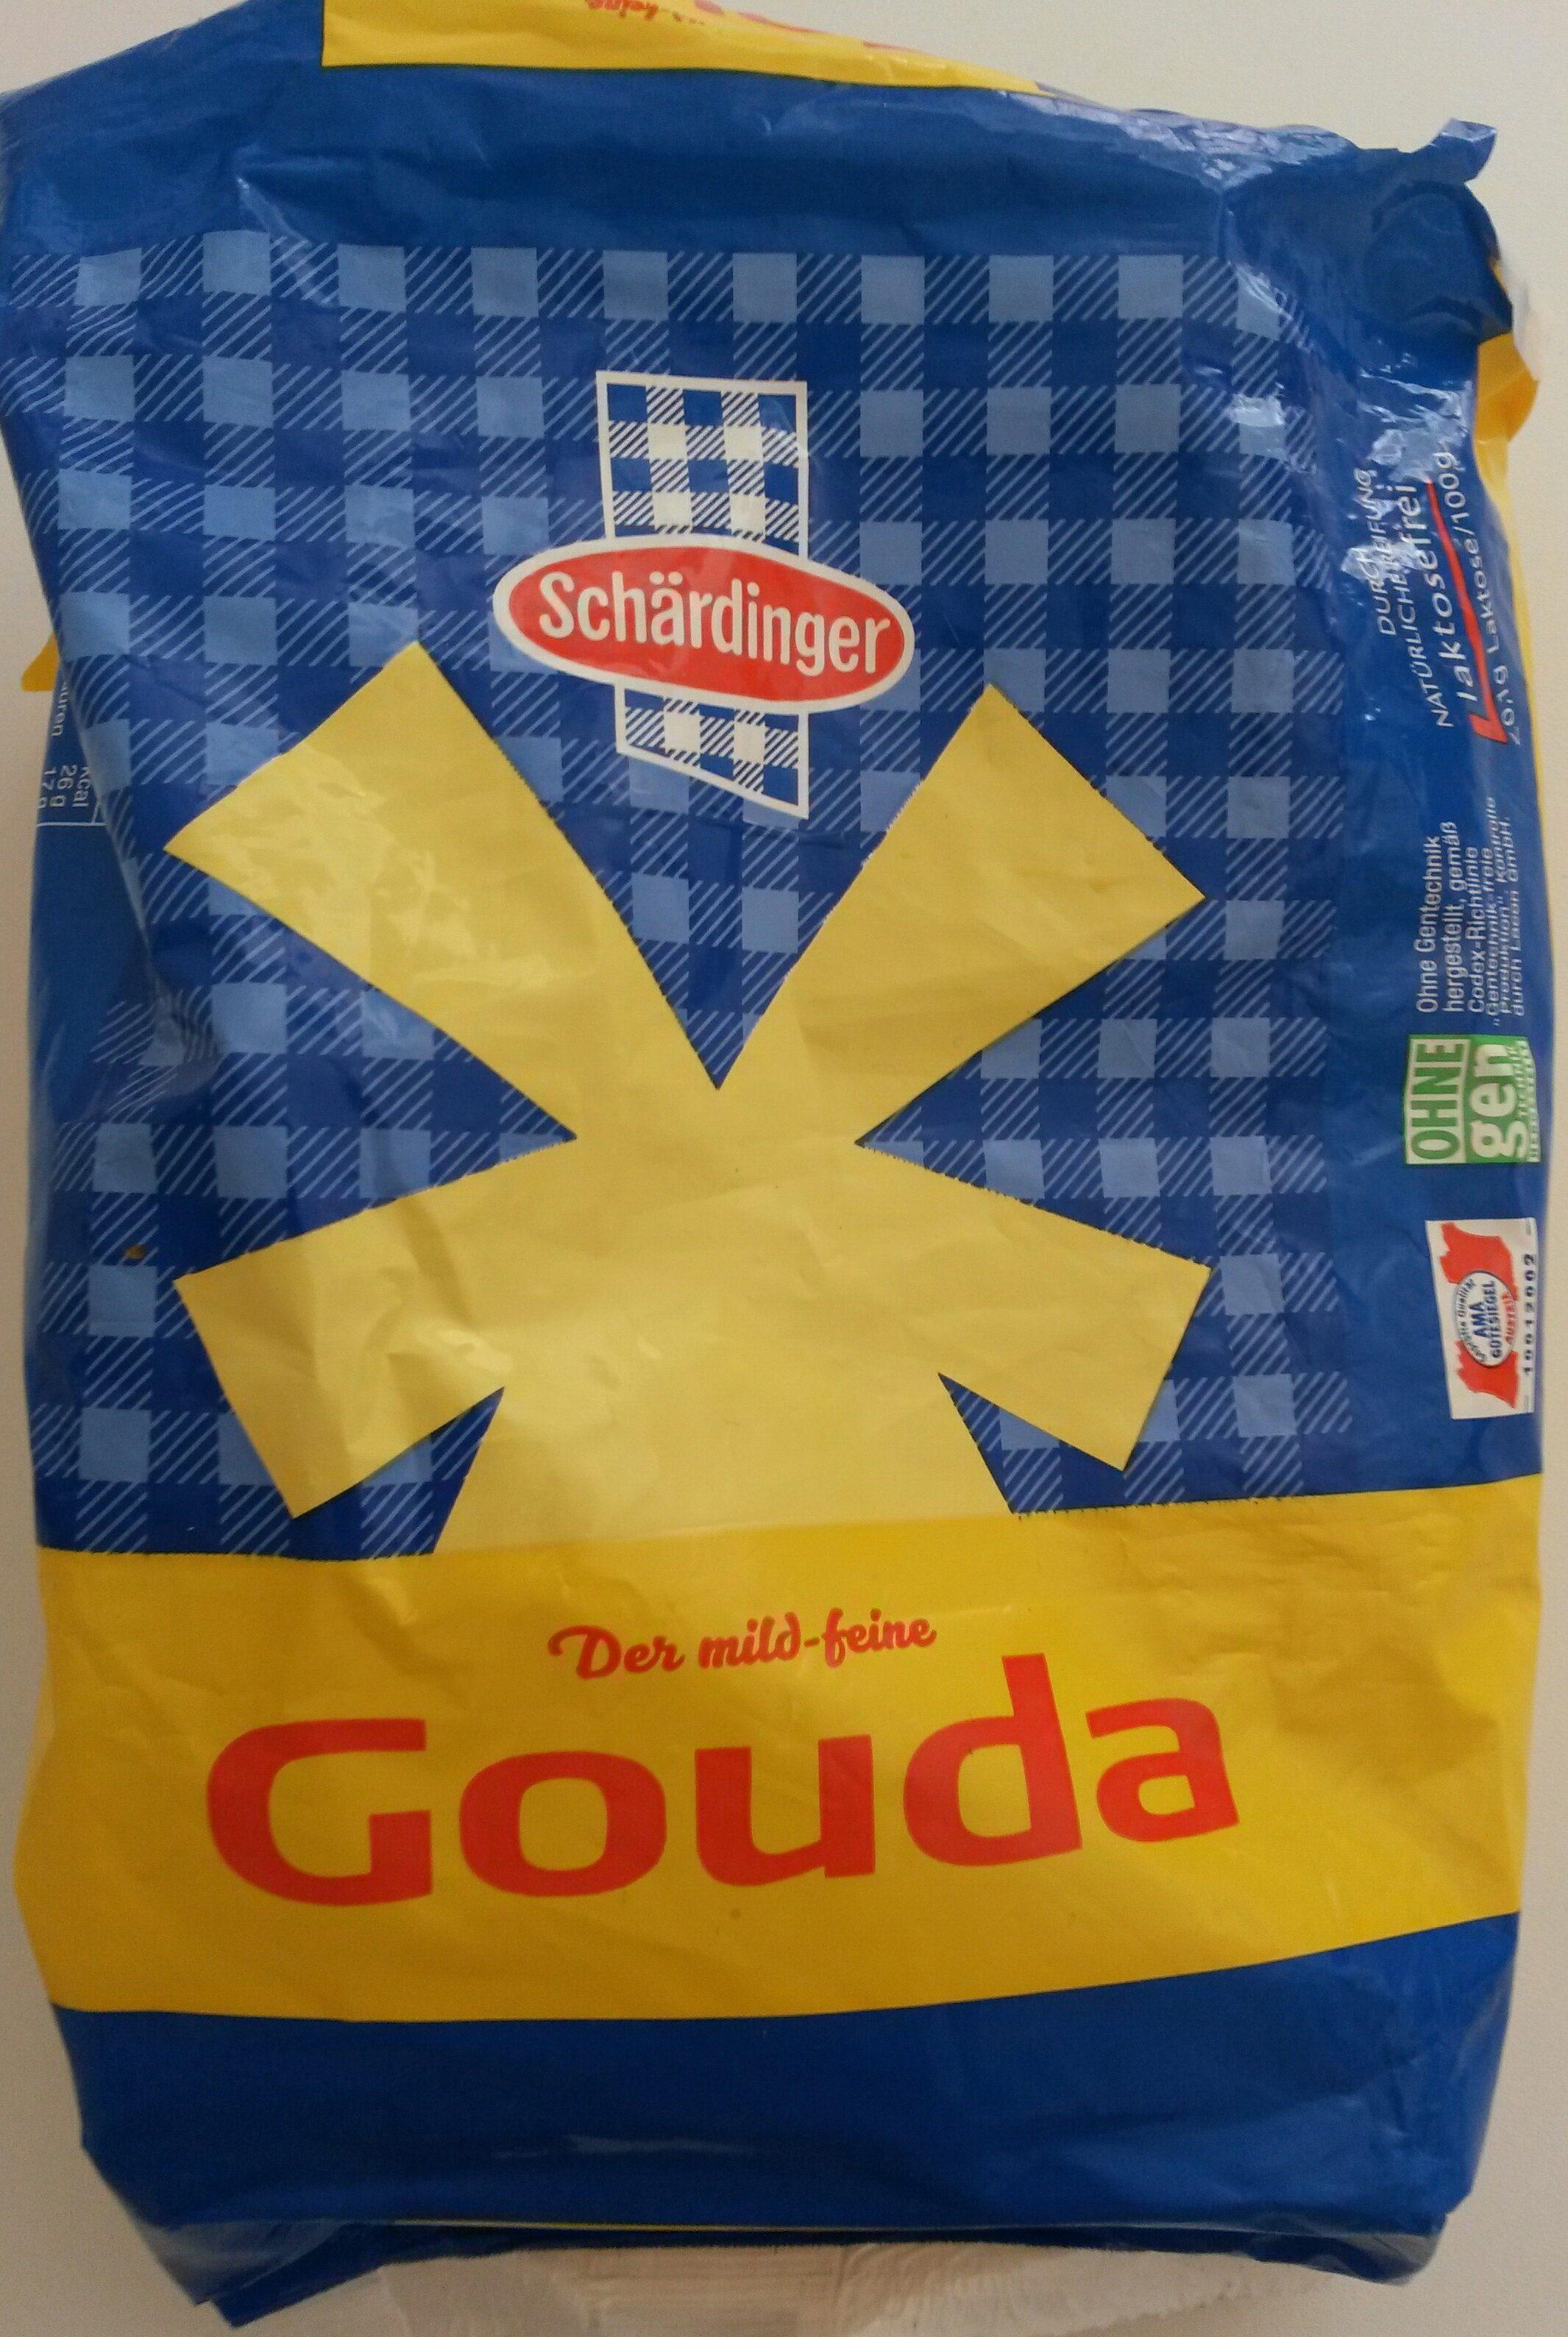 Gouda - Product - de